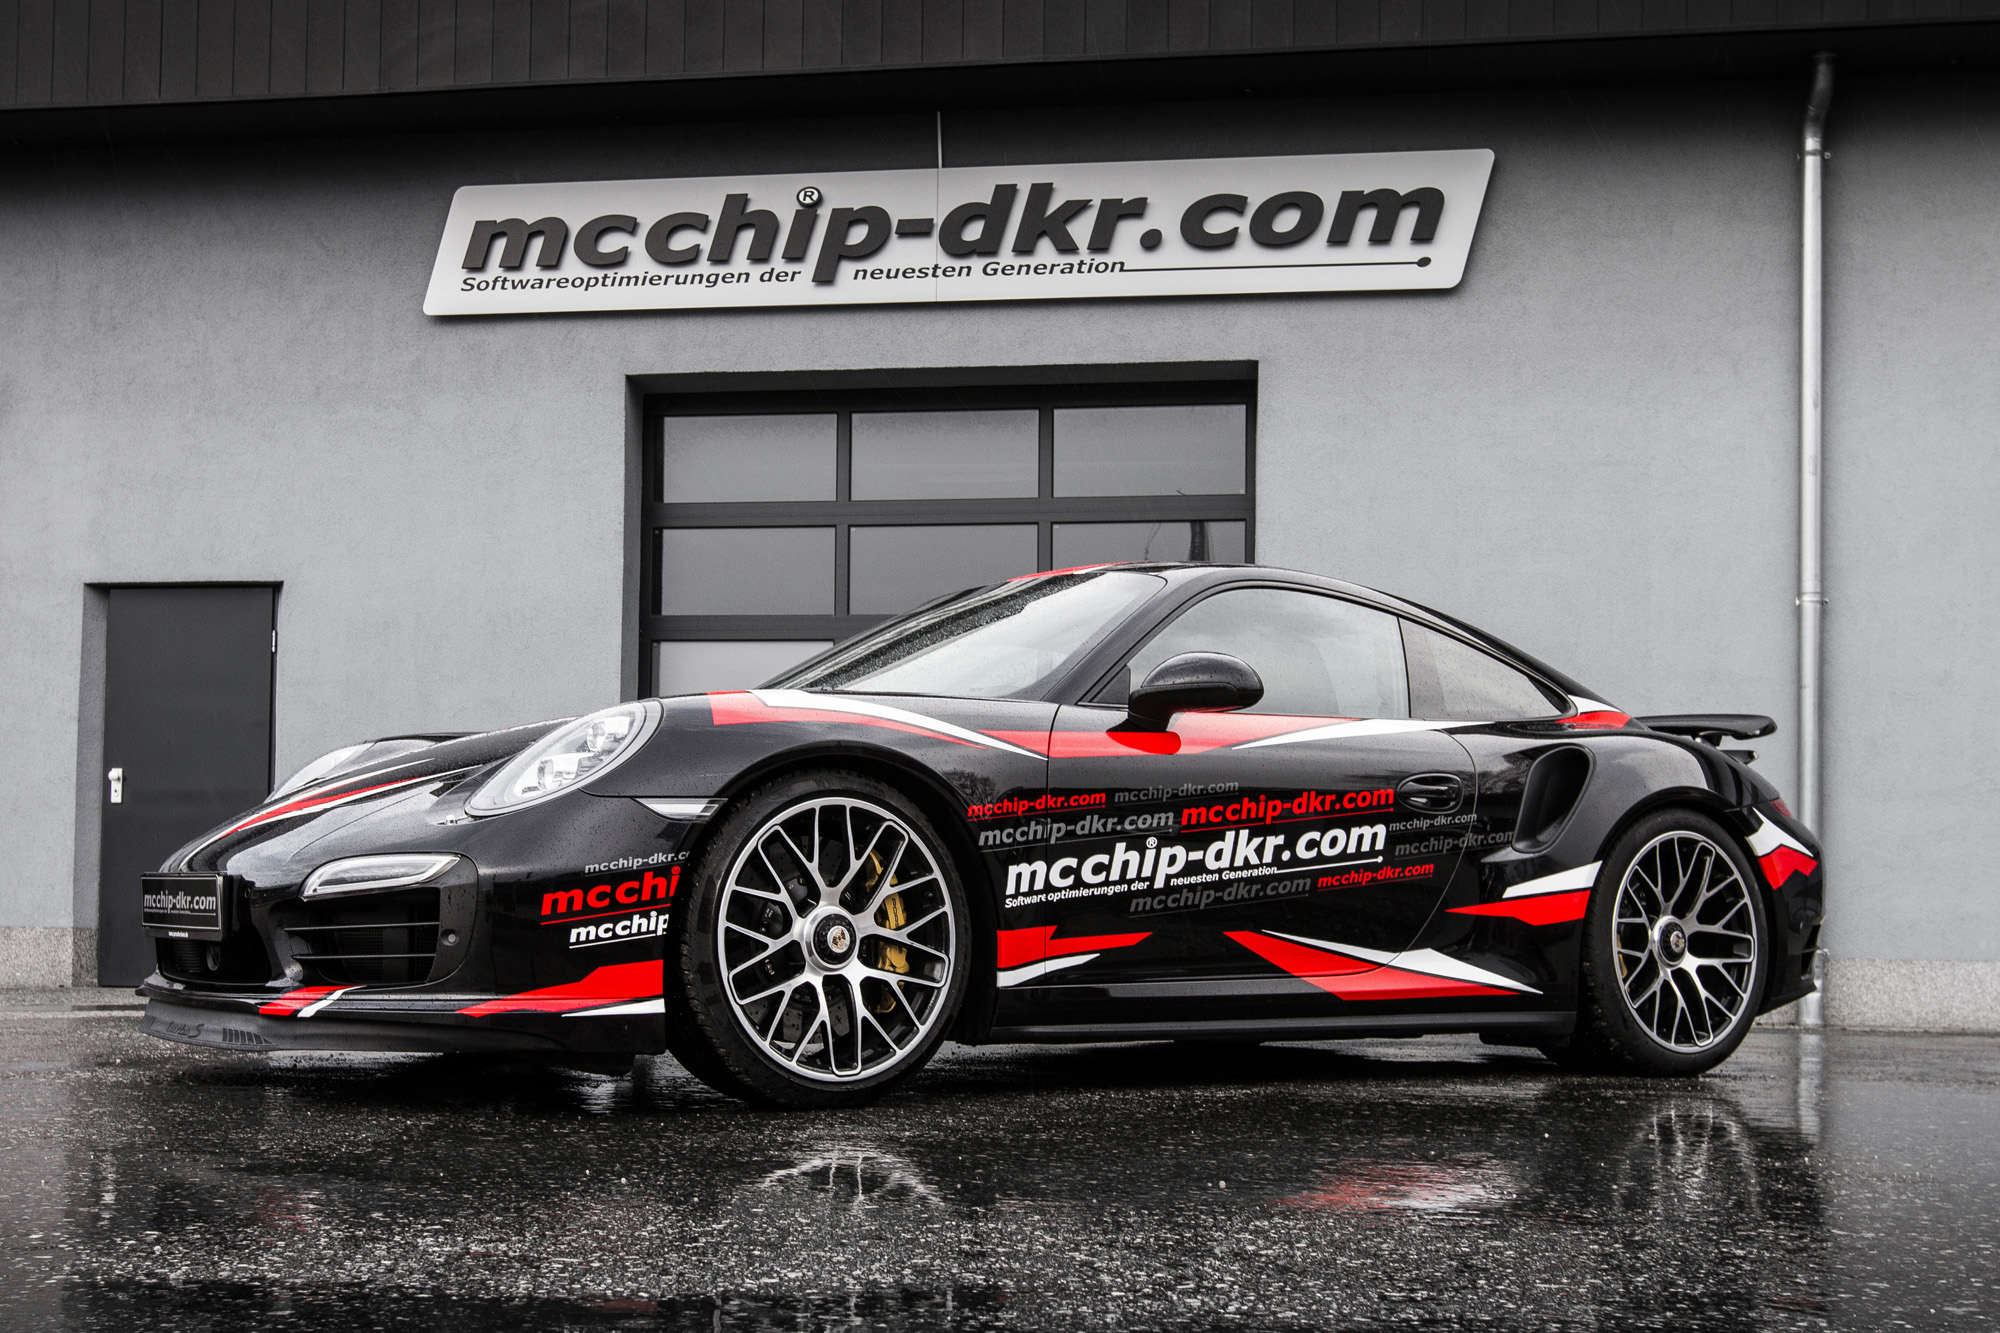 porsche-911-turbo-s-991-mcchip-dkr-01